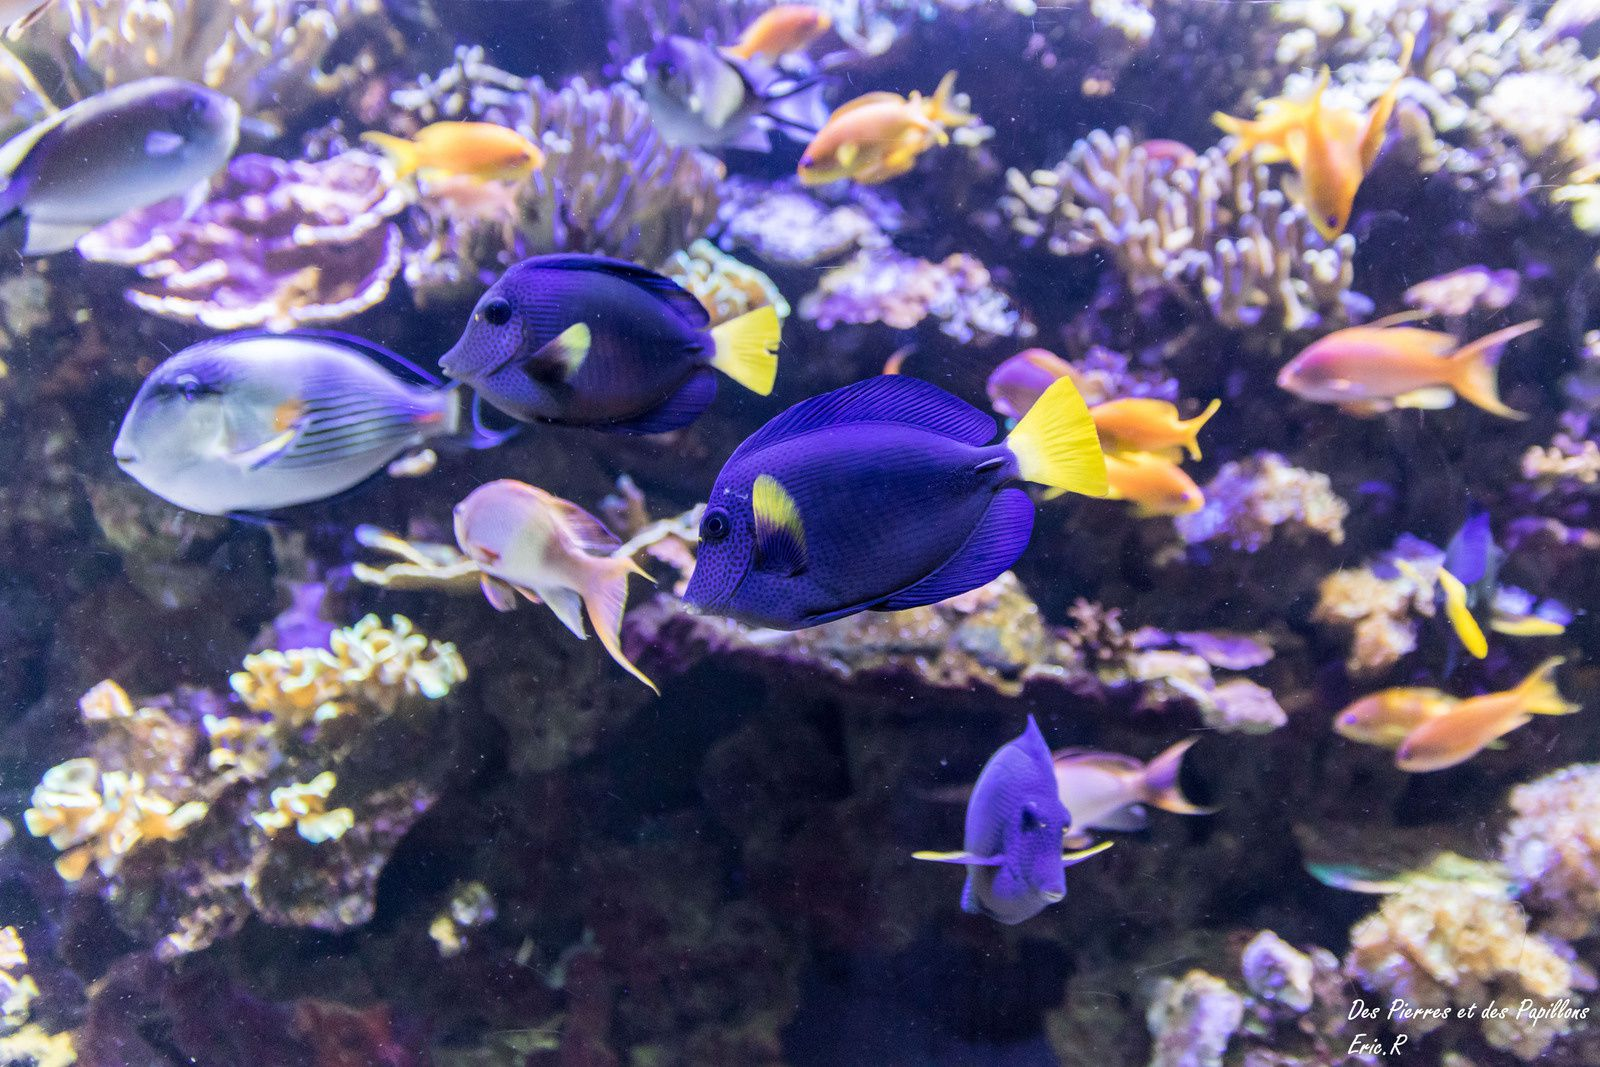 Visite de &quot&#x3B;l'Aquarium du palais de la Porte Dorée&quot&#x3B;.